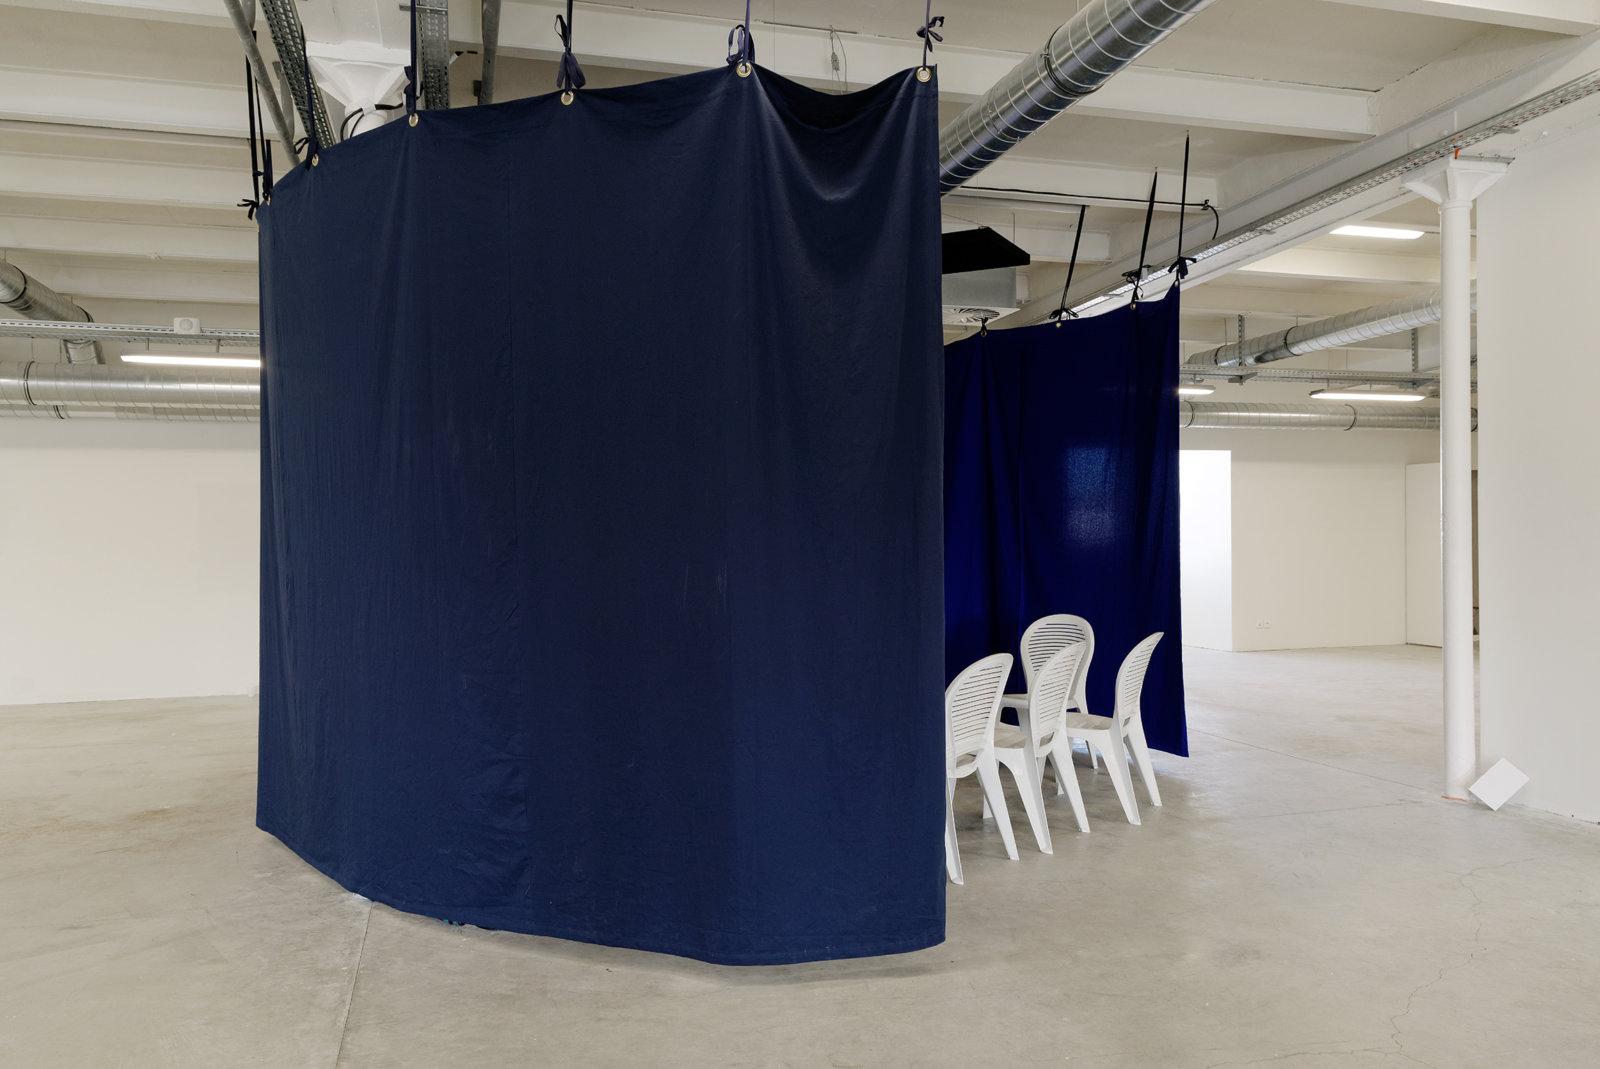 Andrea Buttner No Fear No Shame No Confusion Triangle 2013 Install 01 by Liz Magor